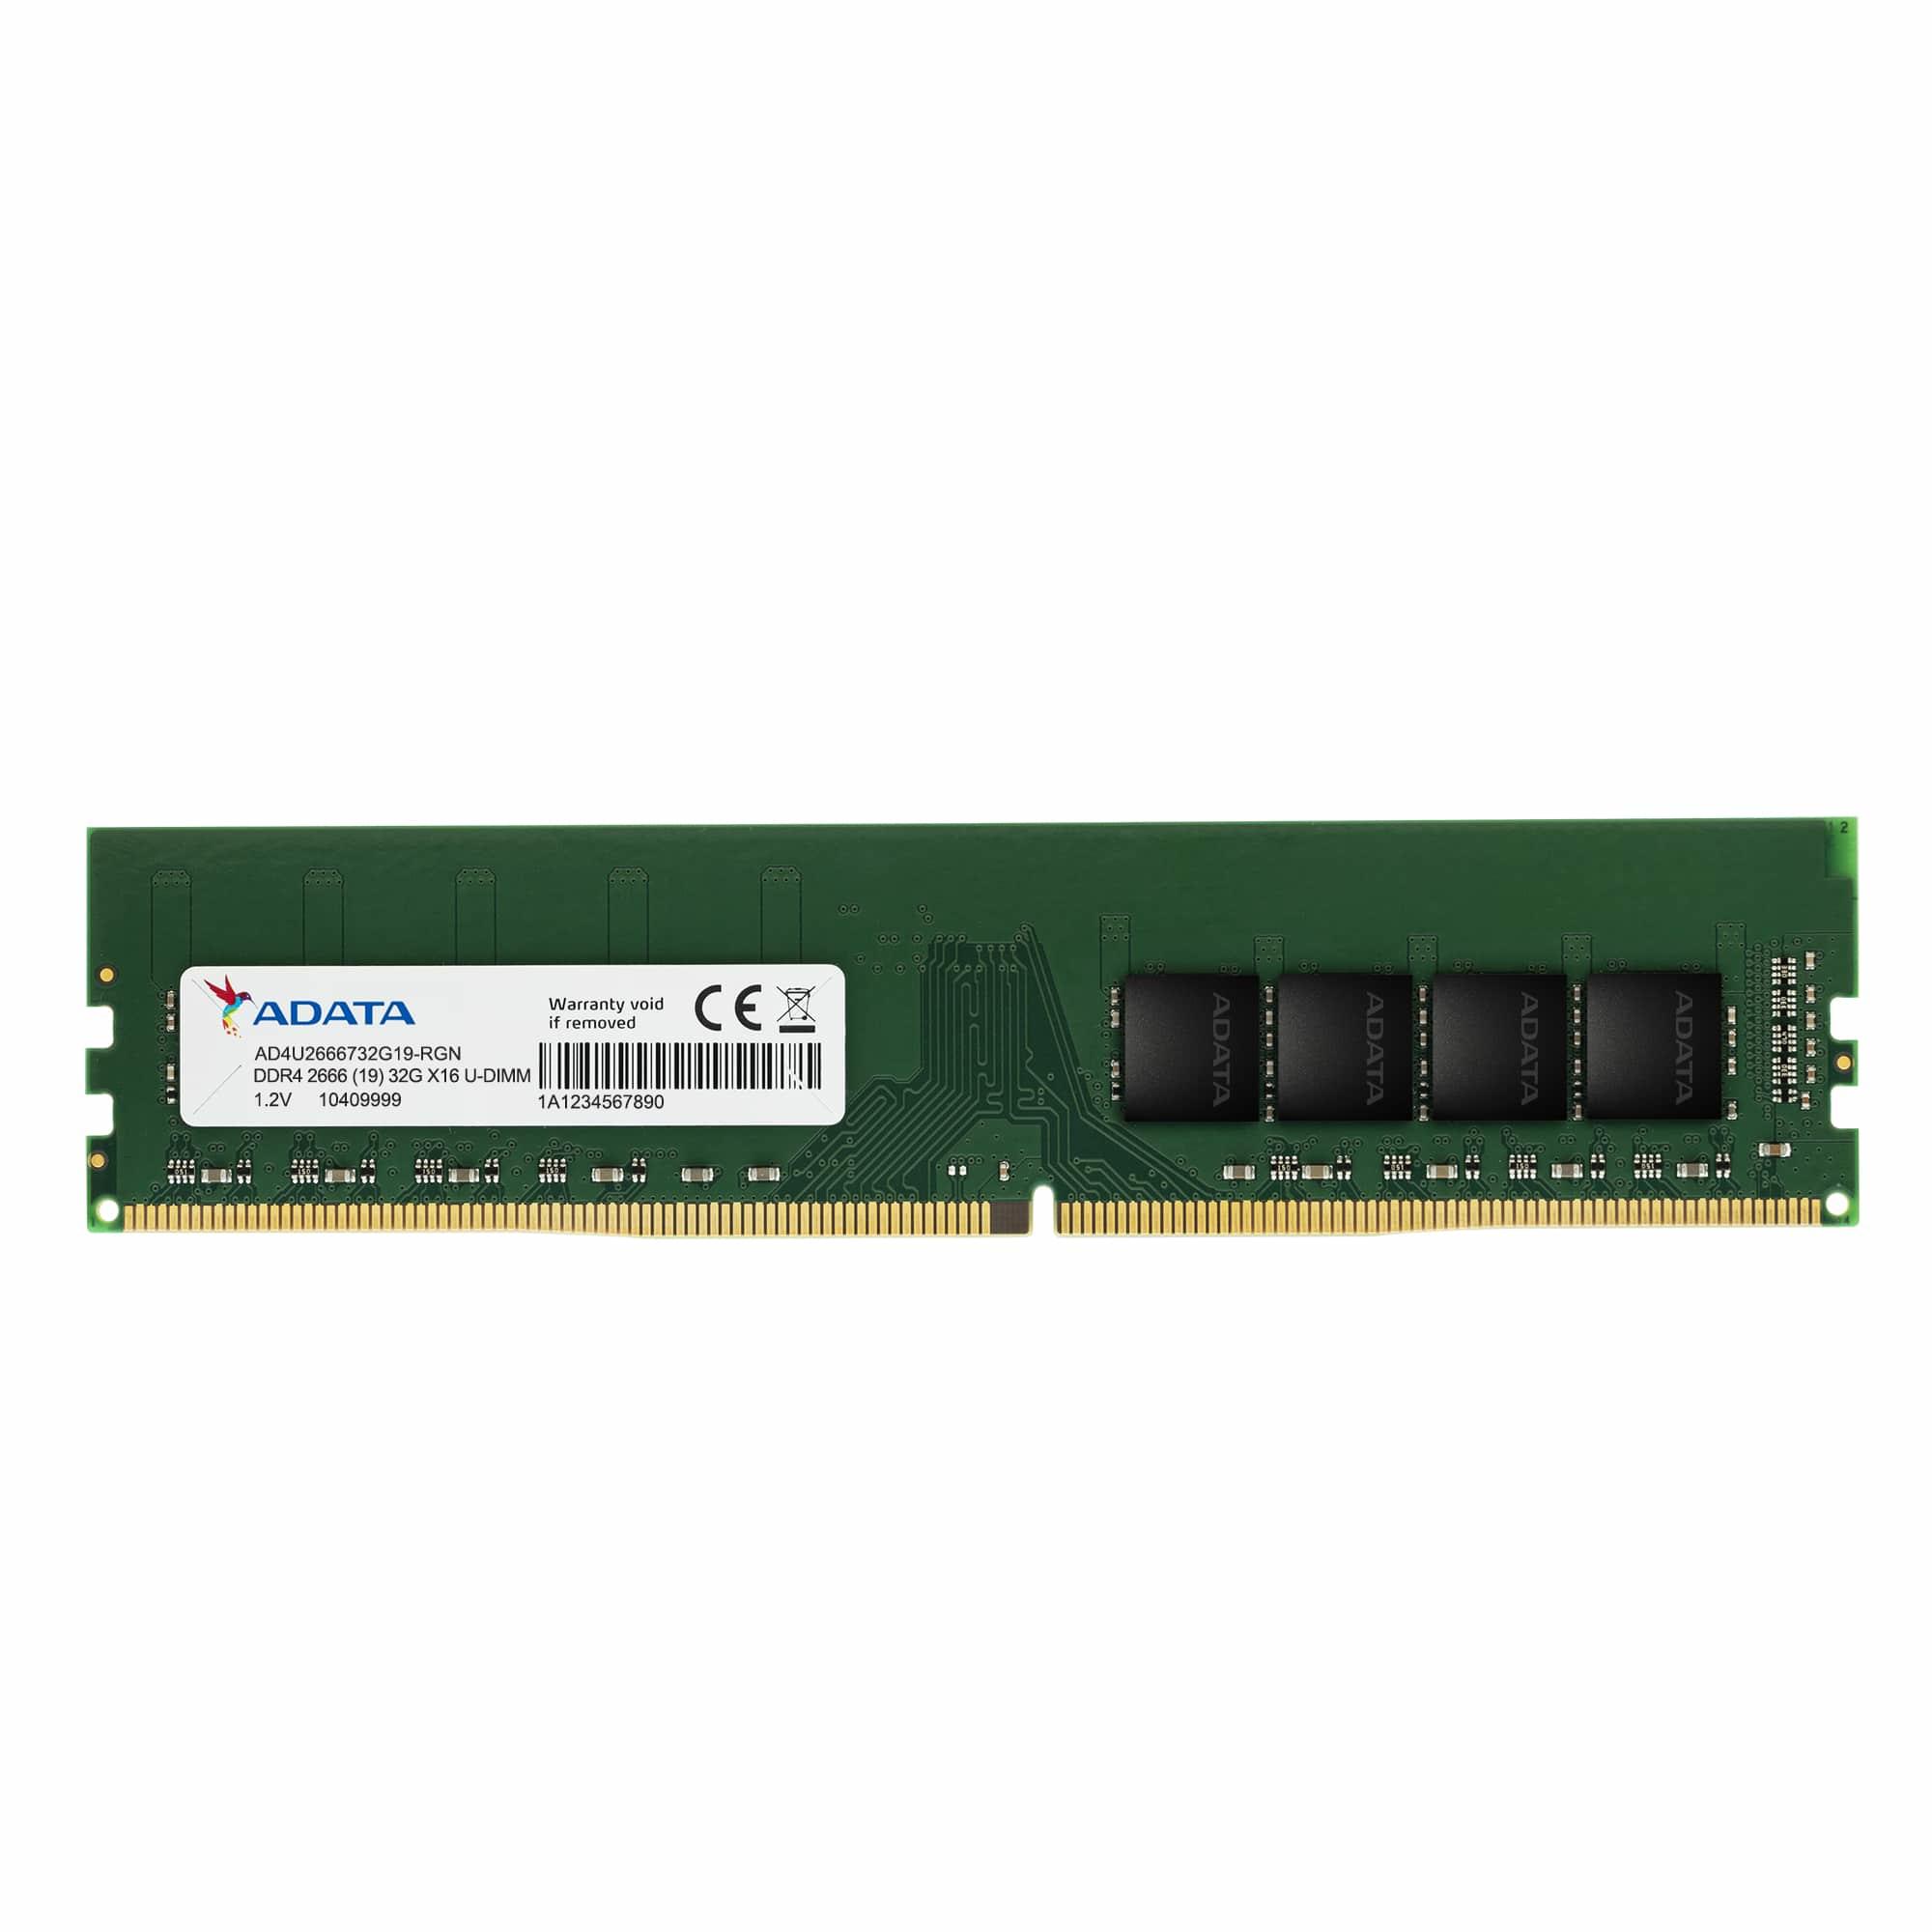 AD4U2666716G19-B MóDULO DE MEMORIA 16 GB DDR4 2666 MHZ